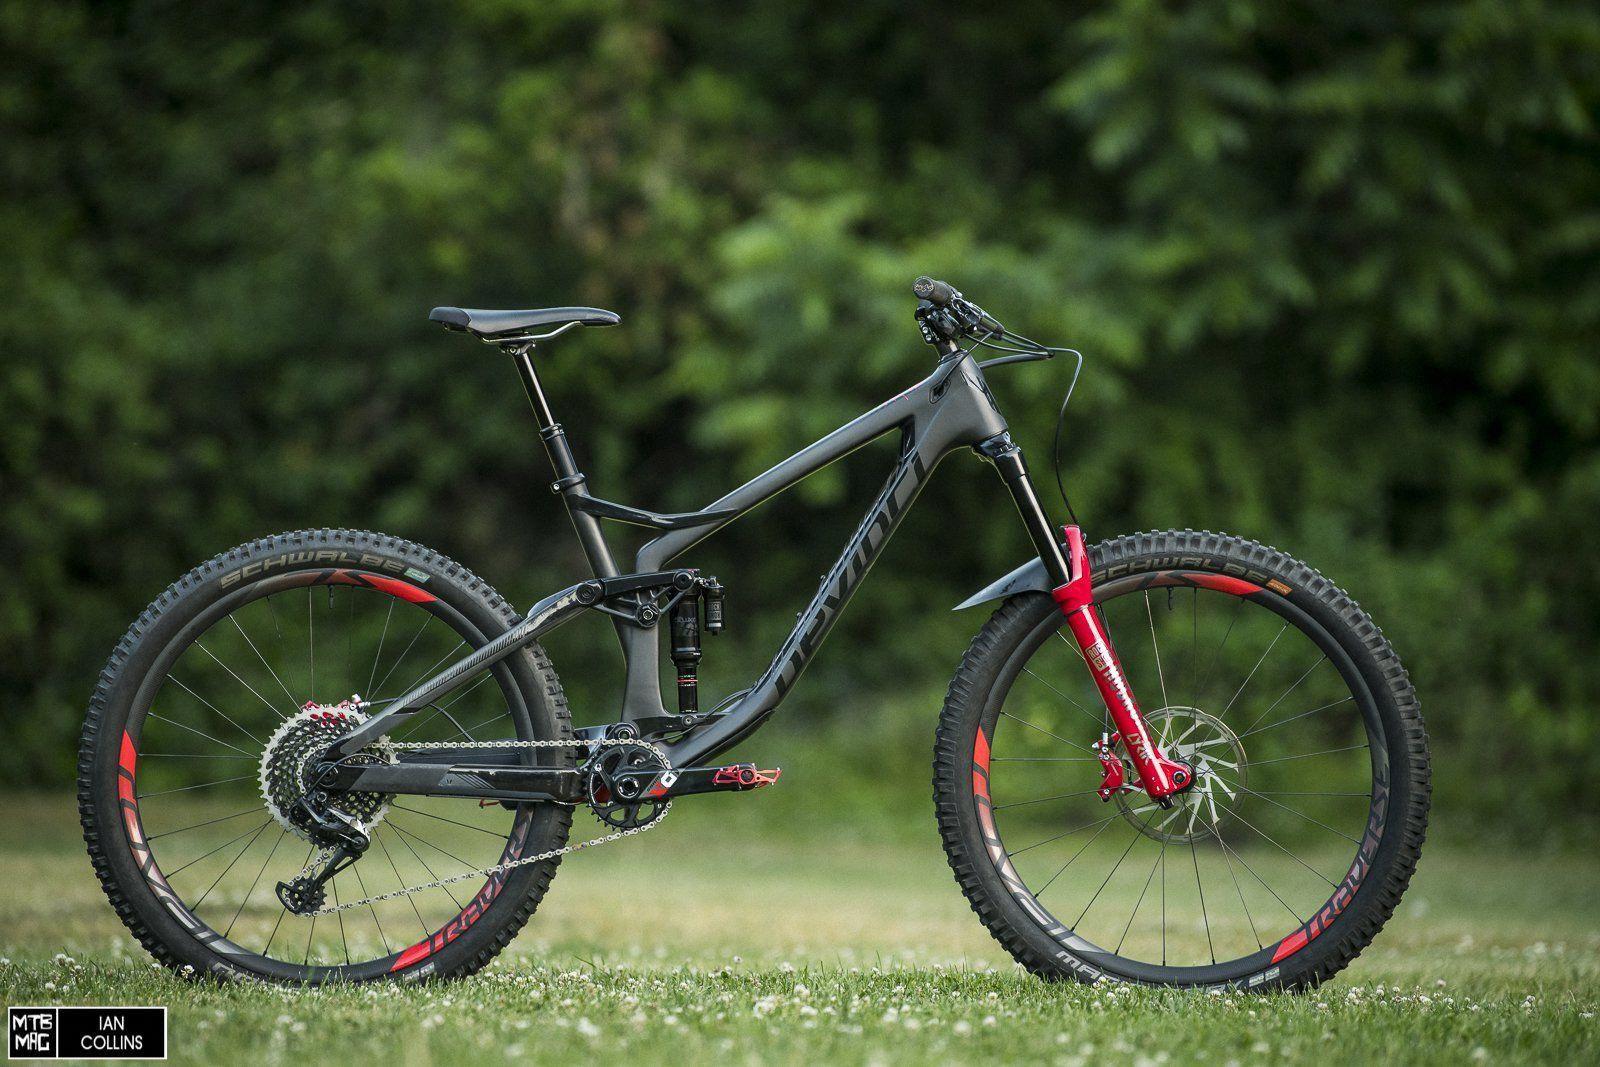 The Best Ways To Purchase A Mountain Bike Mountain Biking Bike